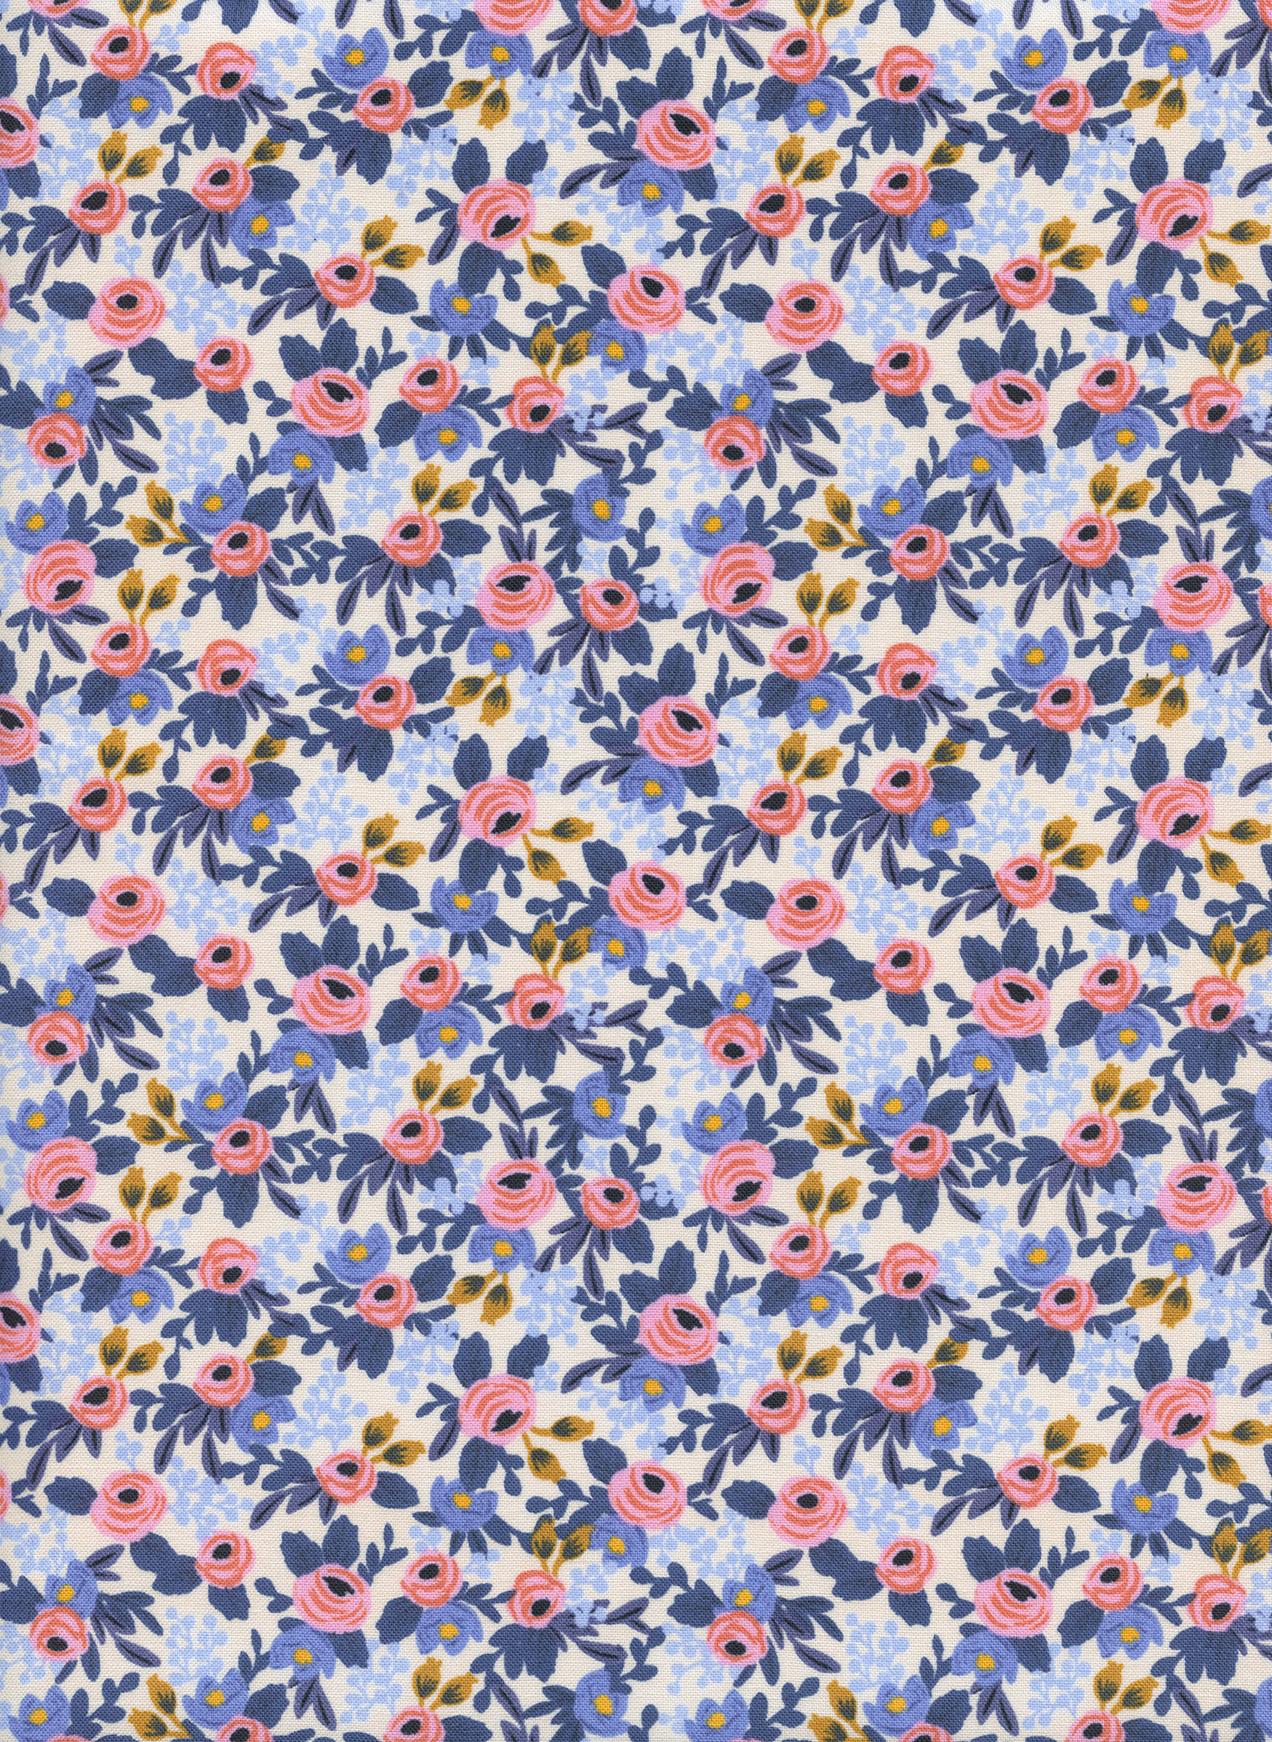 Imagen de producto: https://tienda.costuradiccion.com/img/articulos/secundarias14355-tela-rifle-paper-les-fleurs-azul-claro-algodon-media-yarda-1.jpg